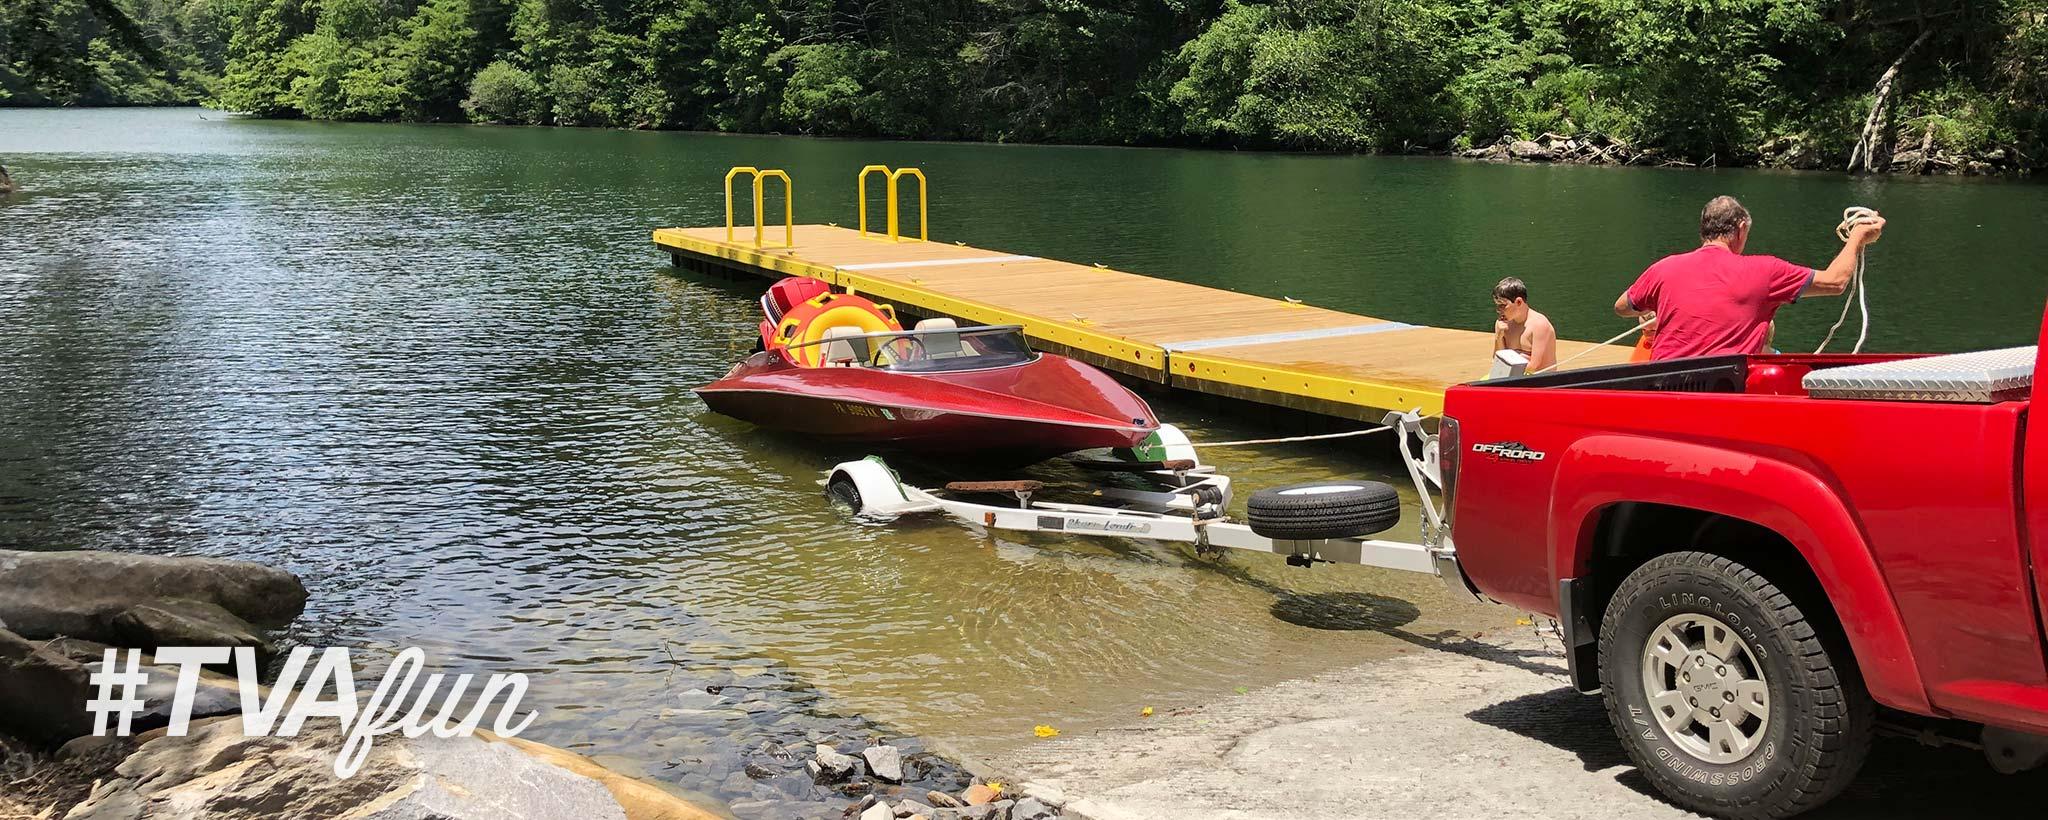 Hiwassee Boat Ramp